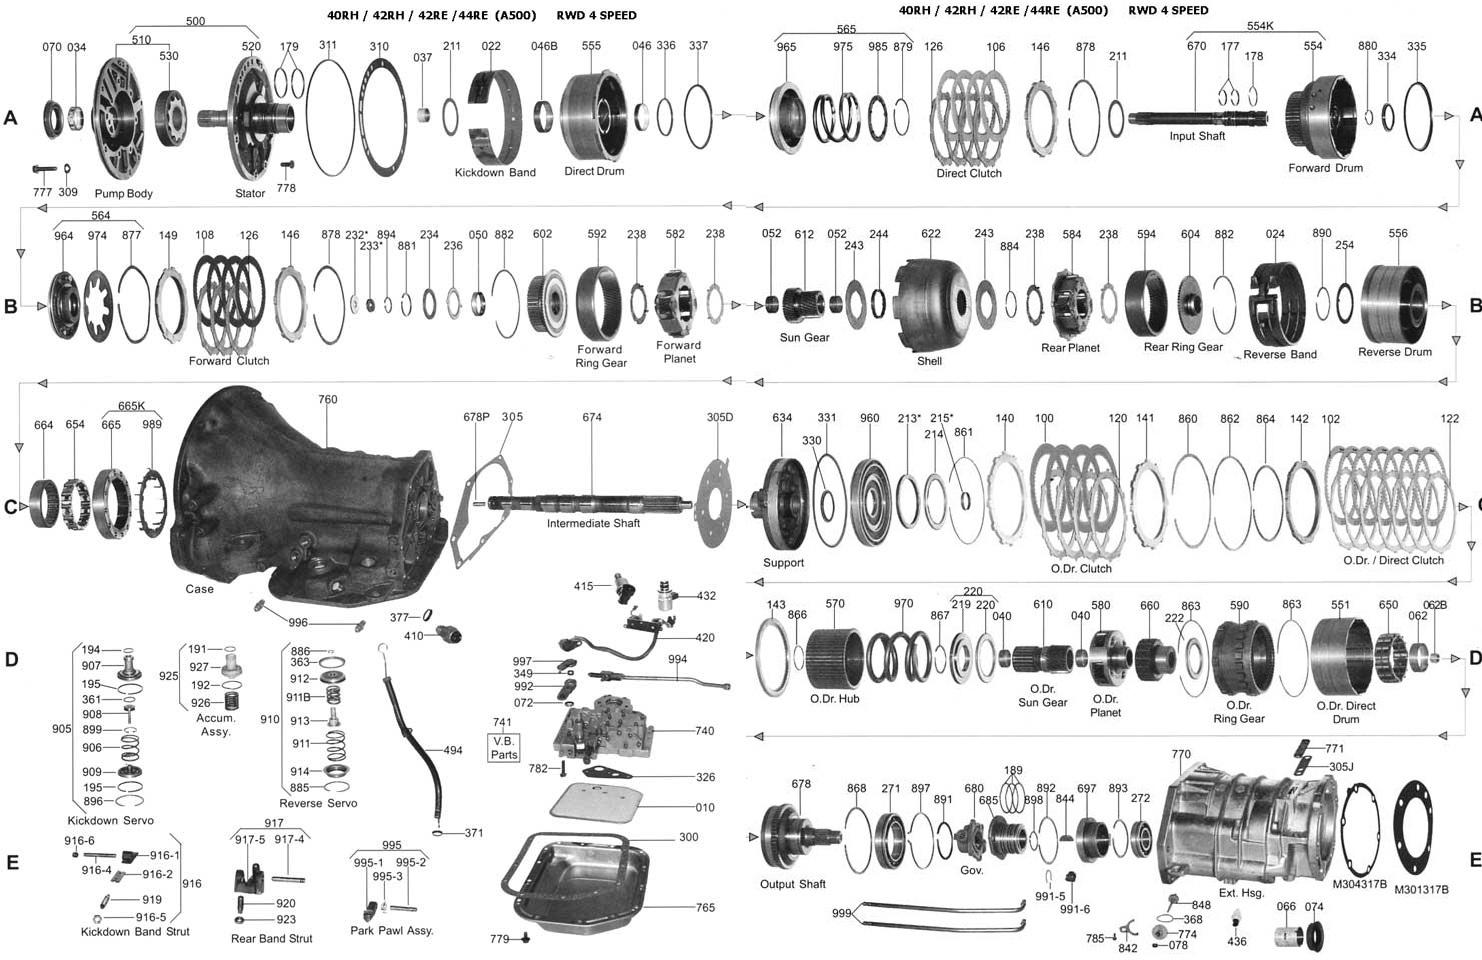 problemas con armado de transmision automatica yoreparo 2000 jeep cherokee manual transmission 2000 jeep cherokee manual transmission for sale